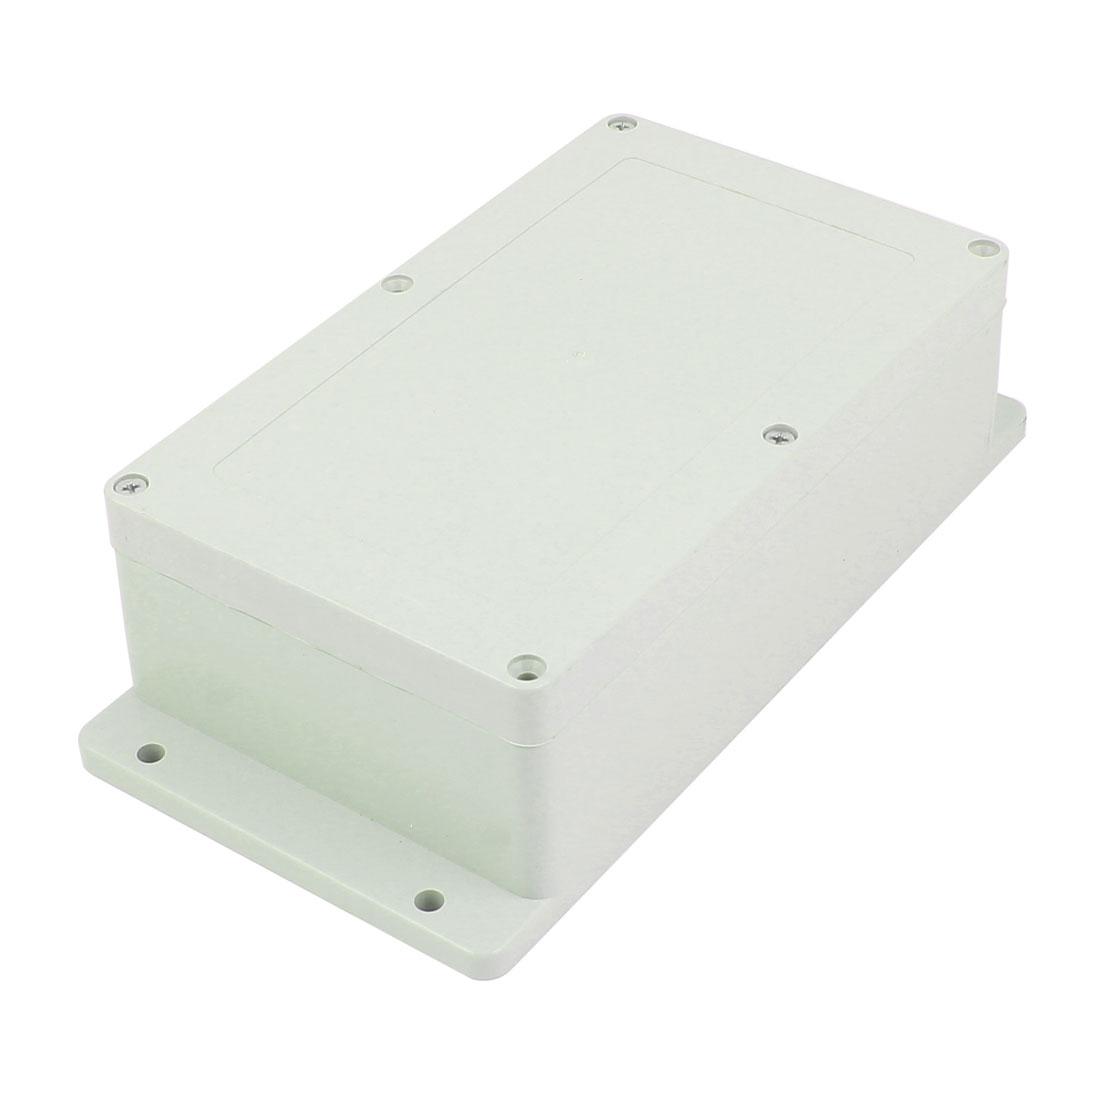 Dustproof IP65 Junction Box Case DIY Terminal Connect Enclosure Adaptable 192mm x 112mm x 59mm